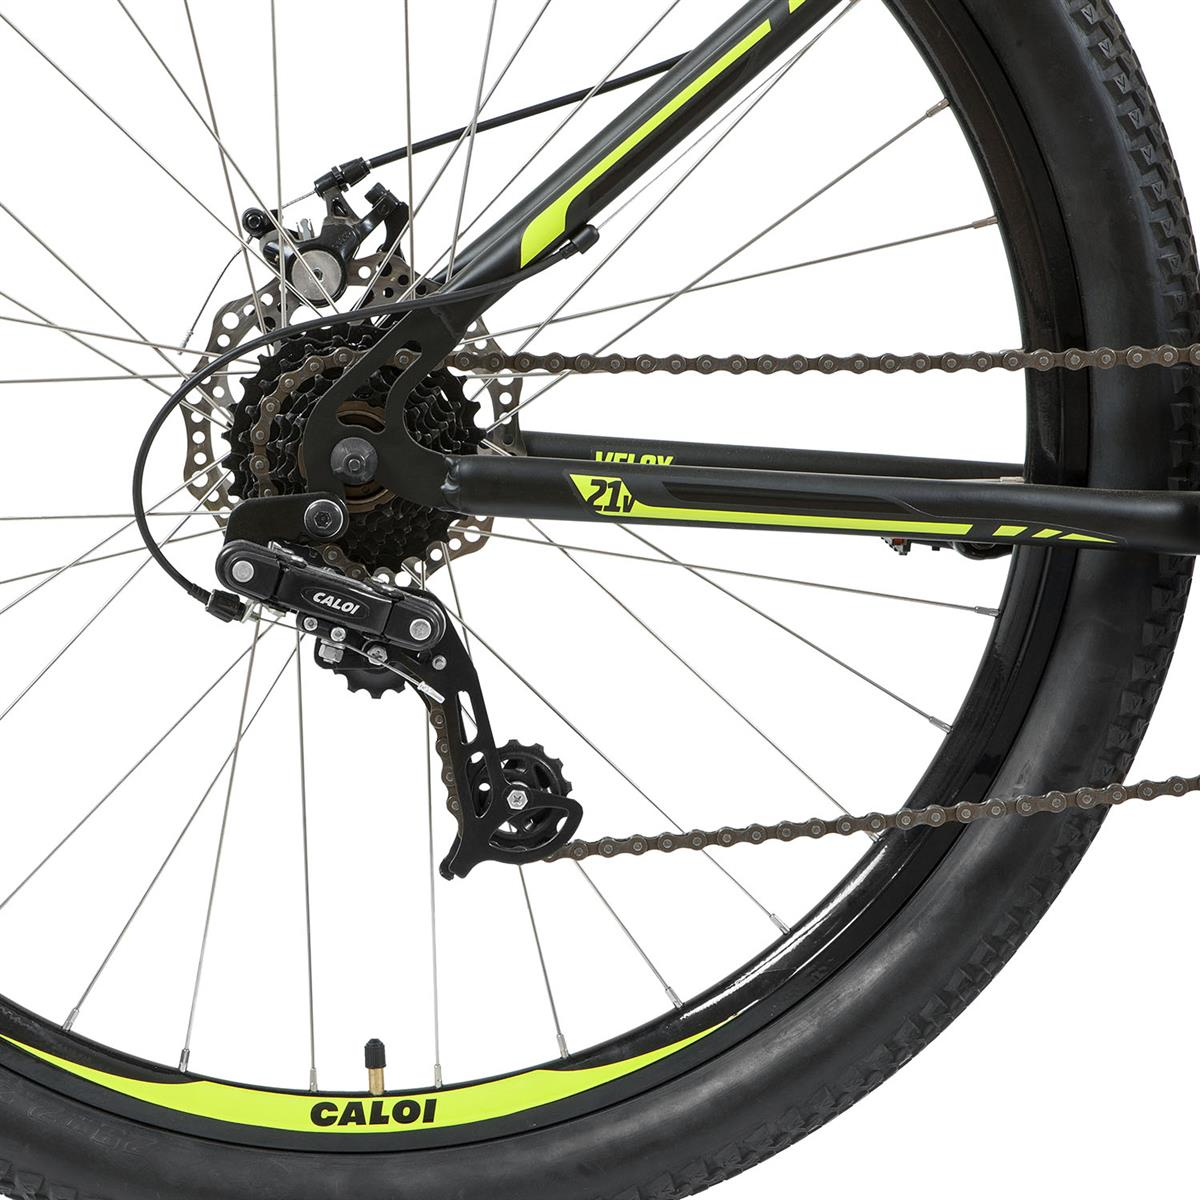 ac5ec46cb Bicicleta Mountain Bike Caloi Velox 21 Marchas Aro 29 Preta Amarela na  Estrela10